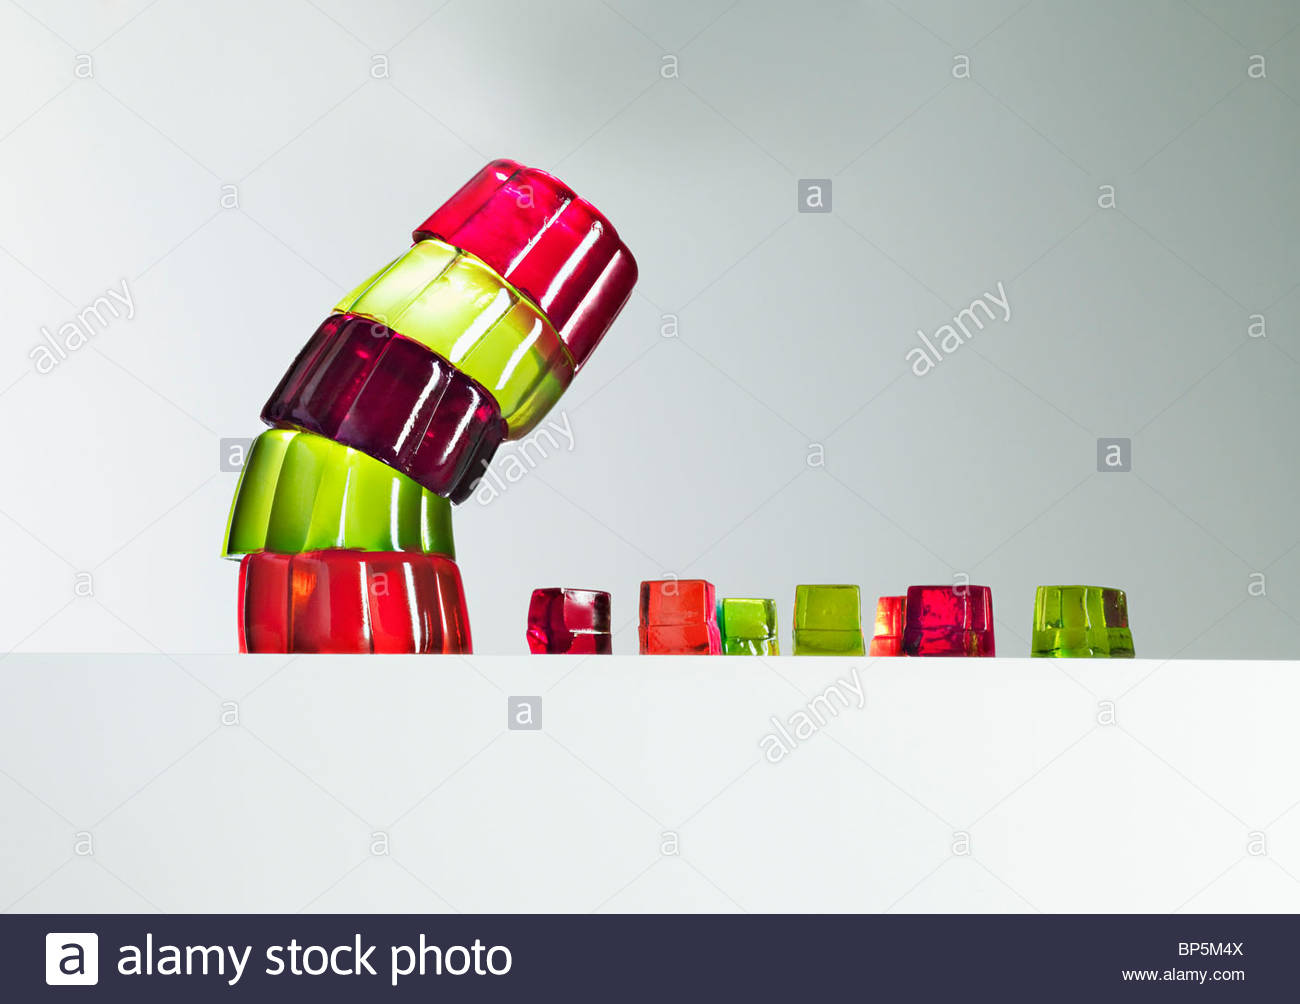 Pila de postres de gelatina vibrante recostada sobre pequeños cubos de postres de gelatina Imagen De Stock